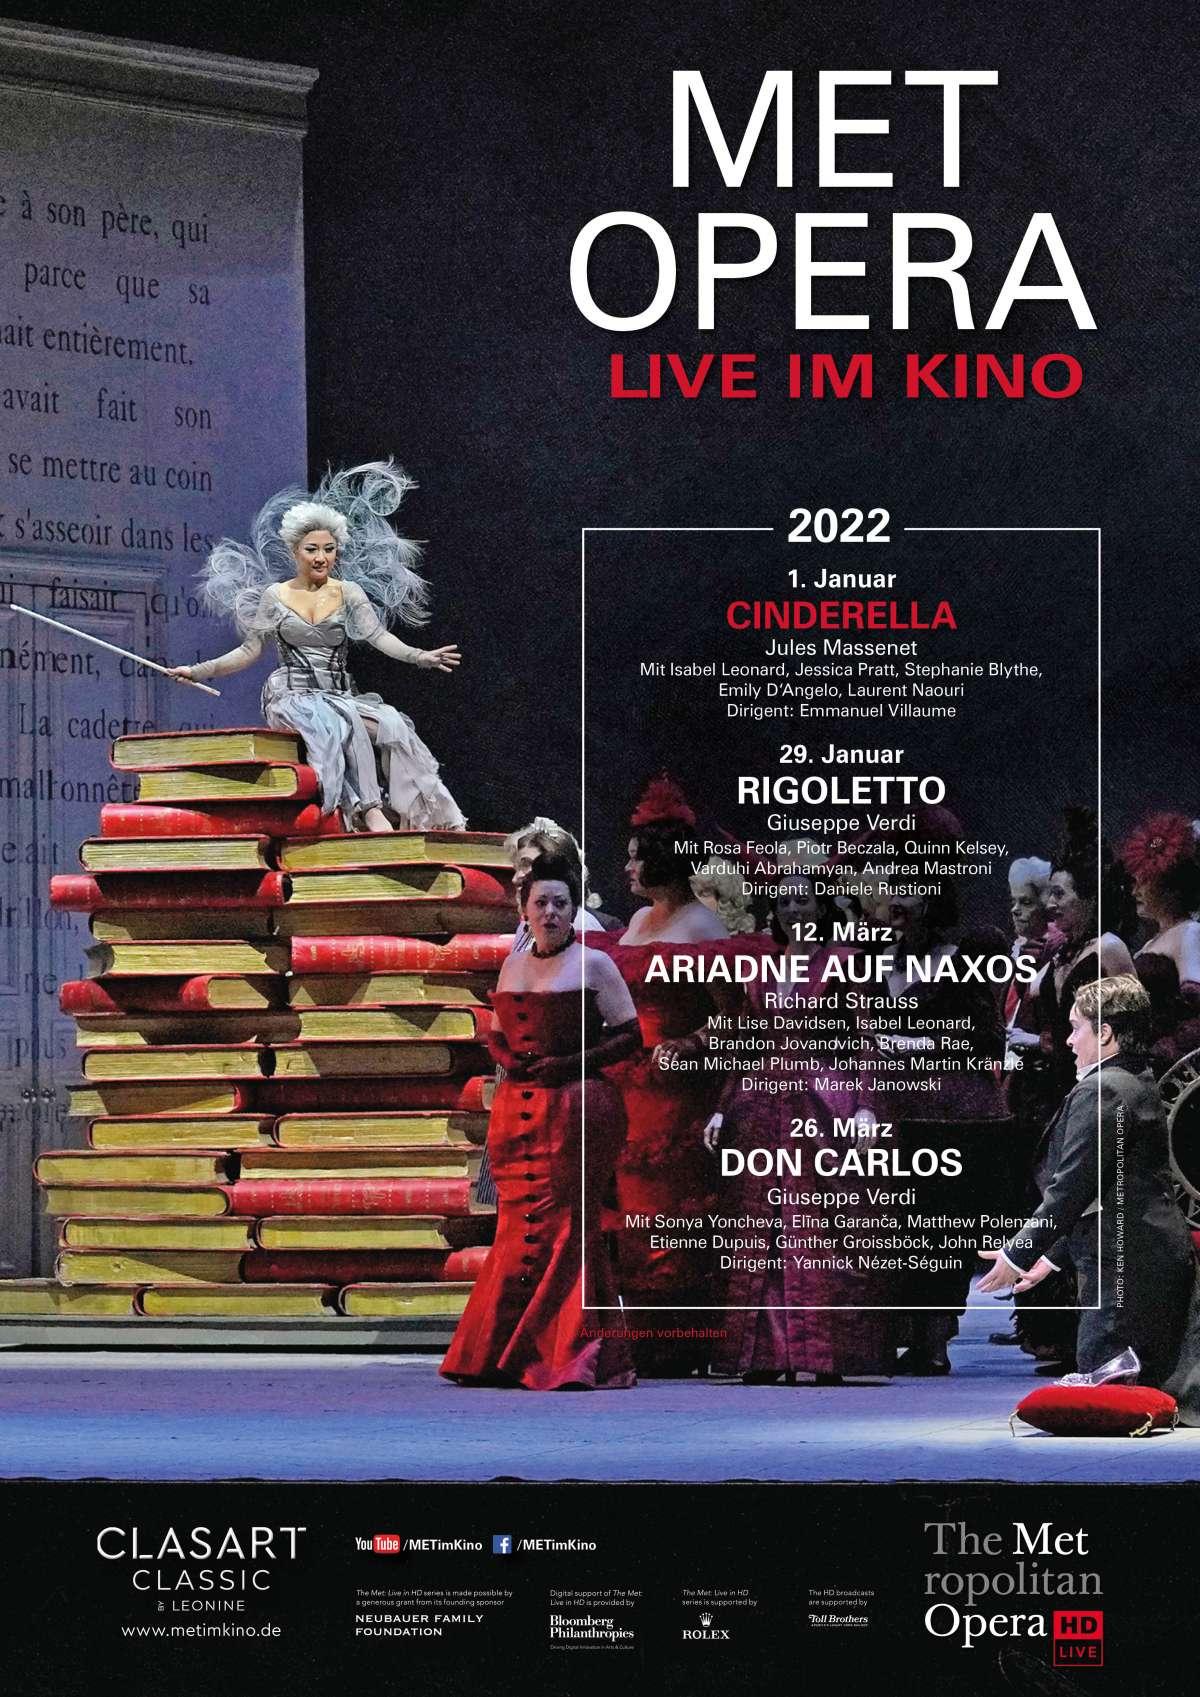 Met Opera: Cinderella (Jules Massenet)